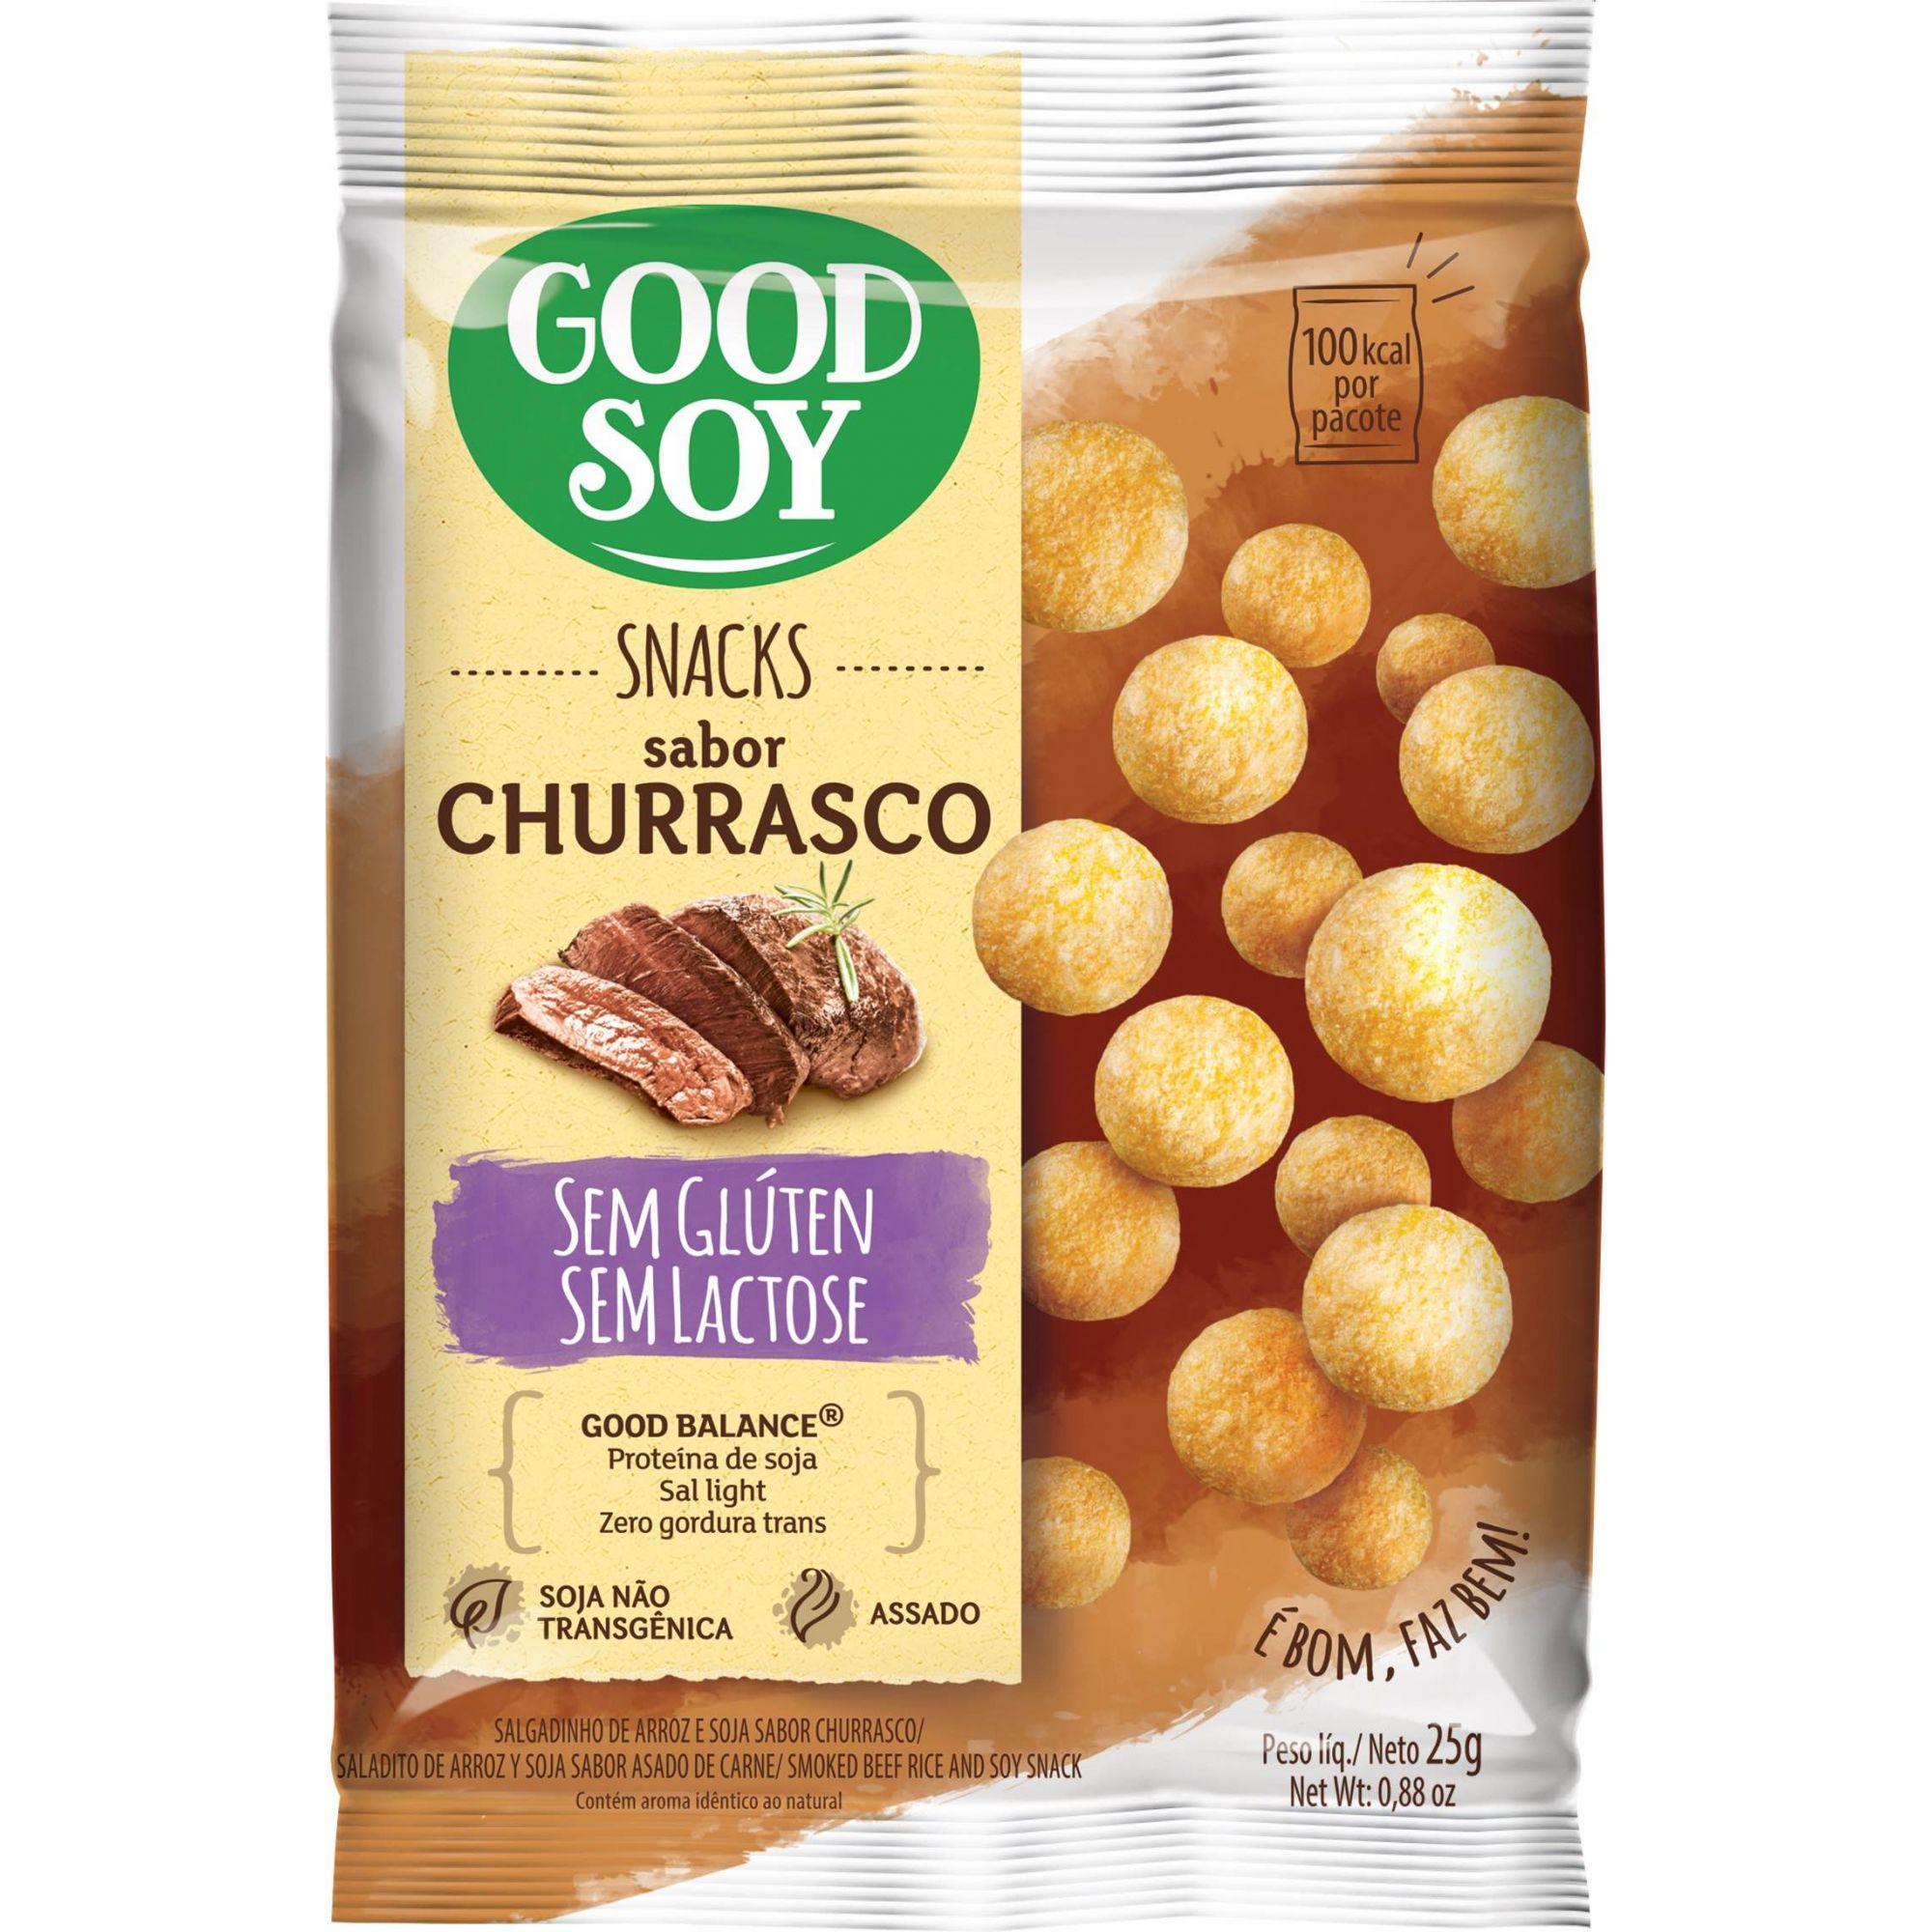 Snack salgadinho de Soja sabor Churrasco 25g - GoodSoy